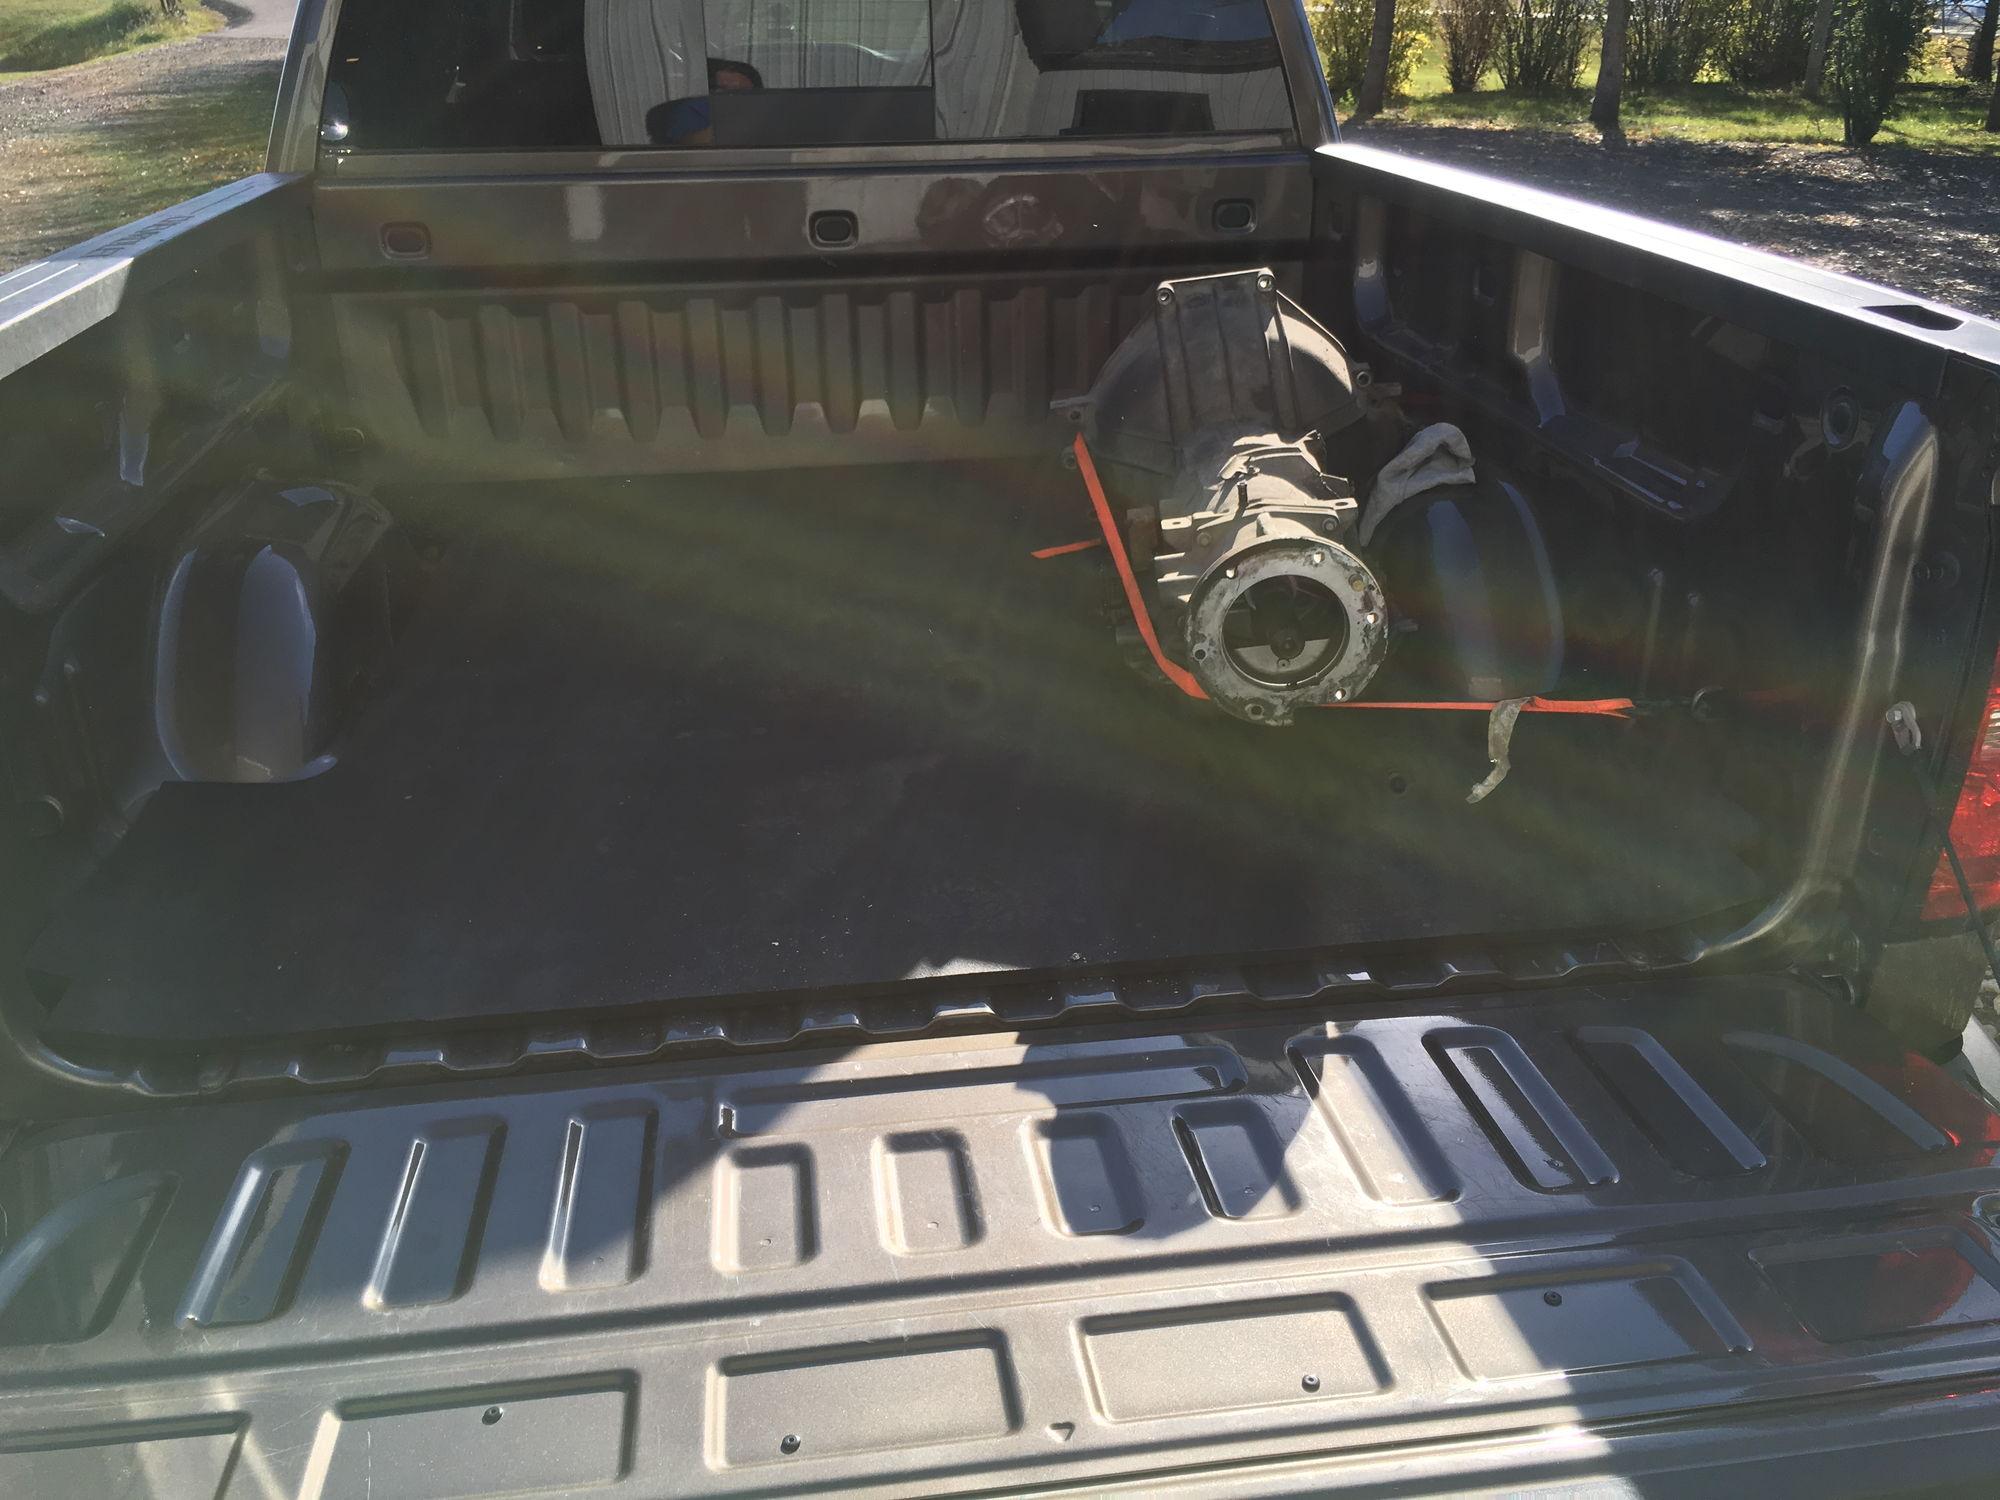 Picked up the rebuilt transmission